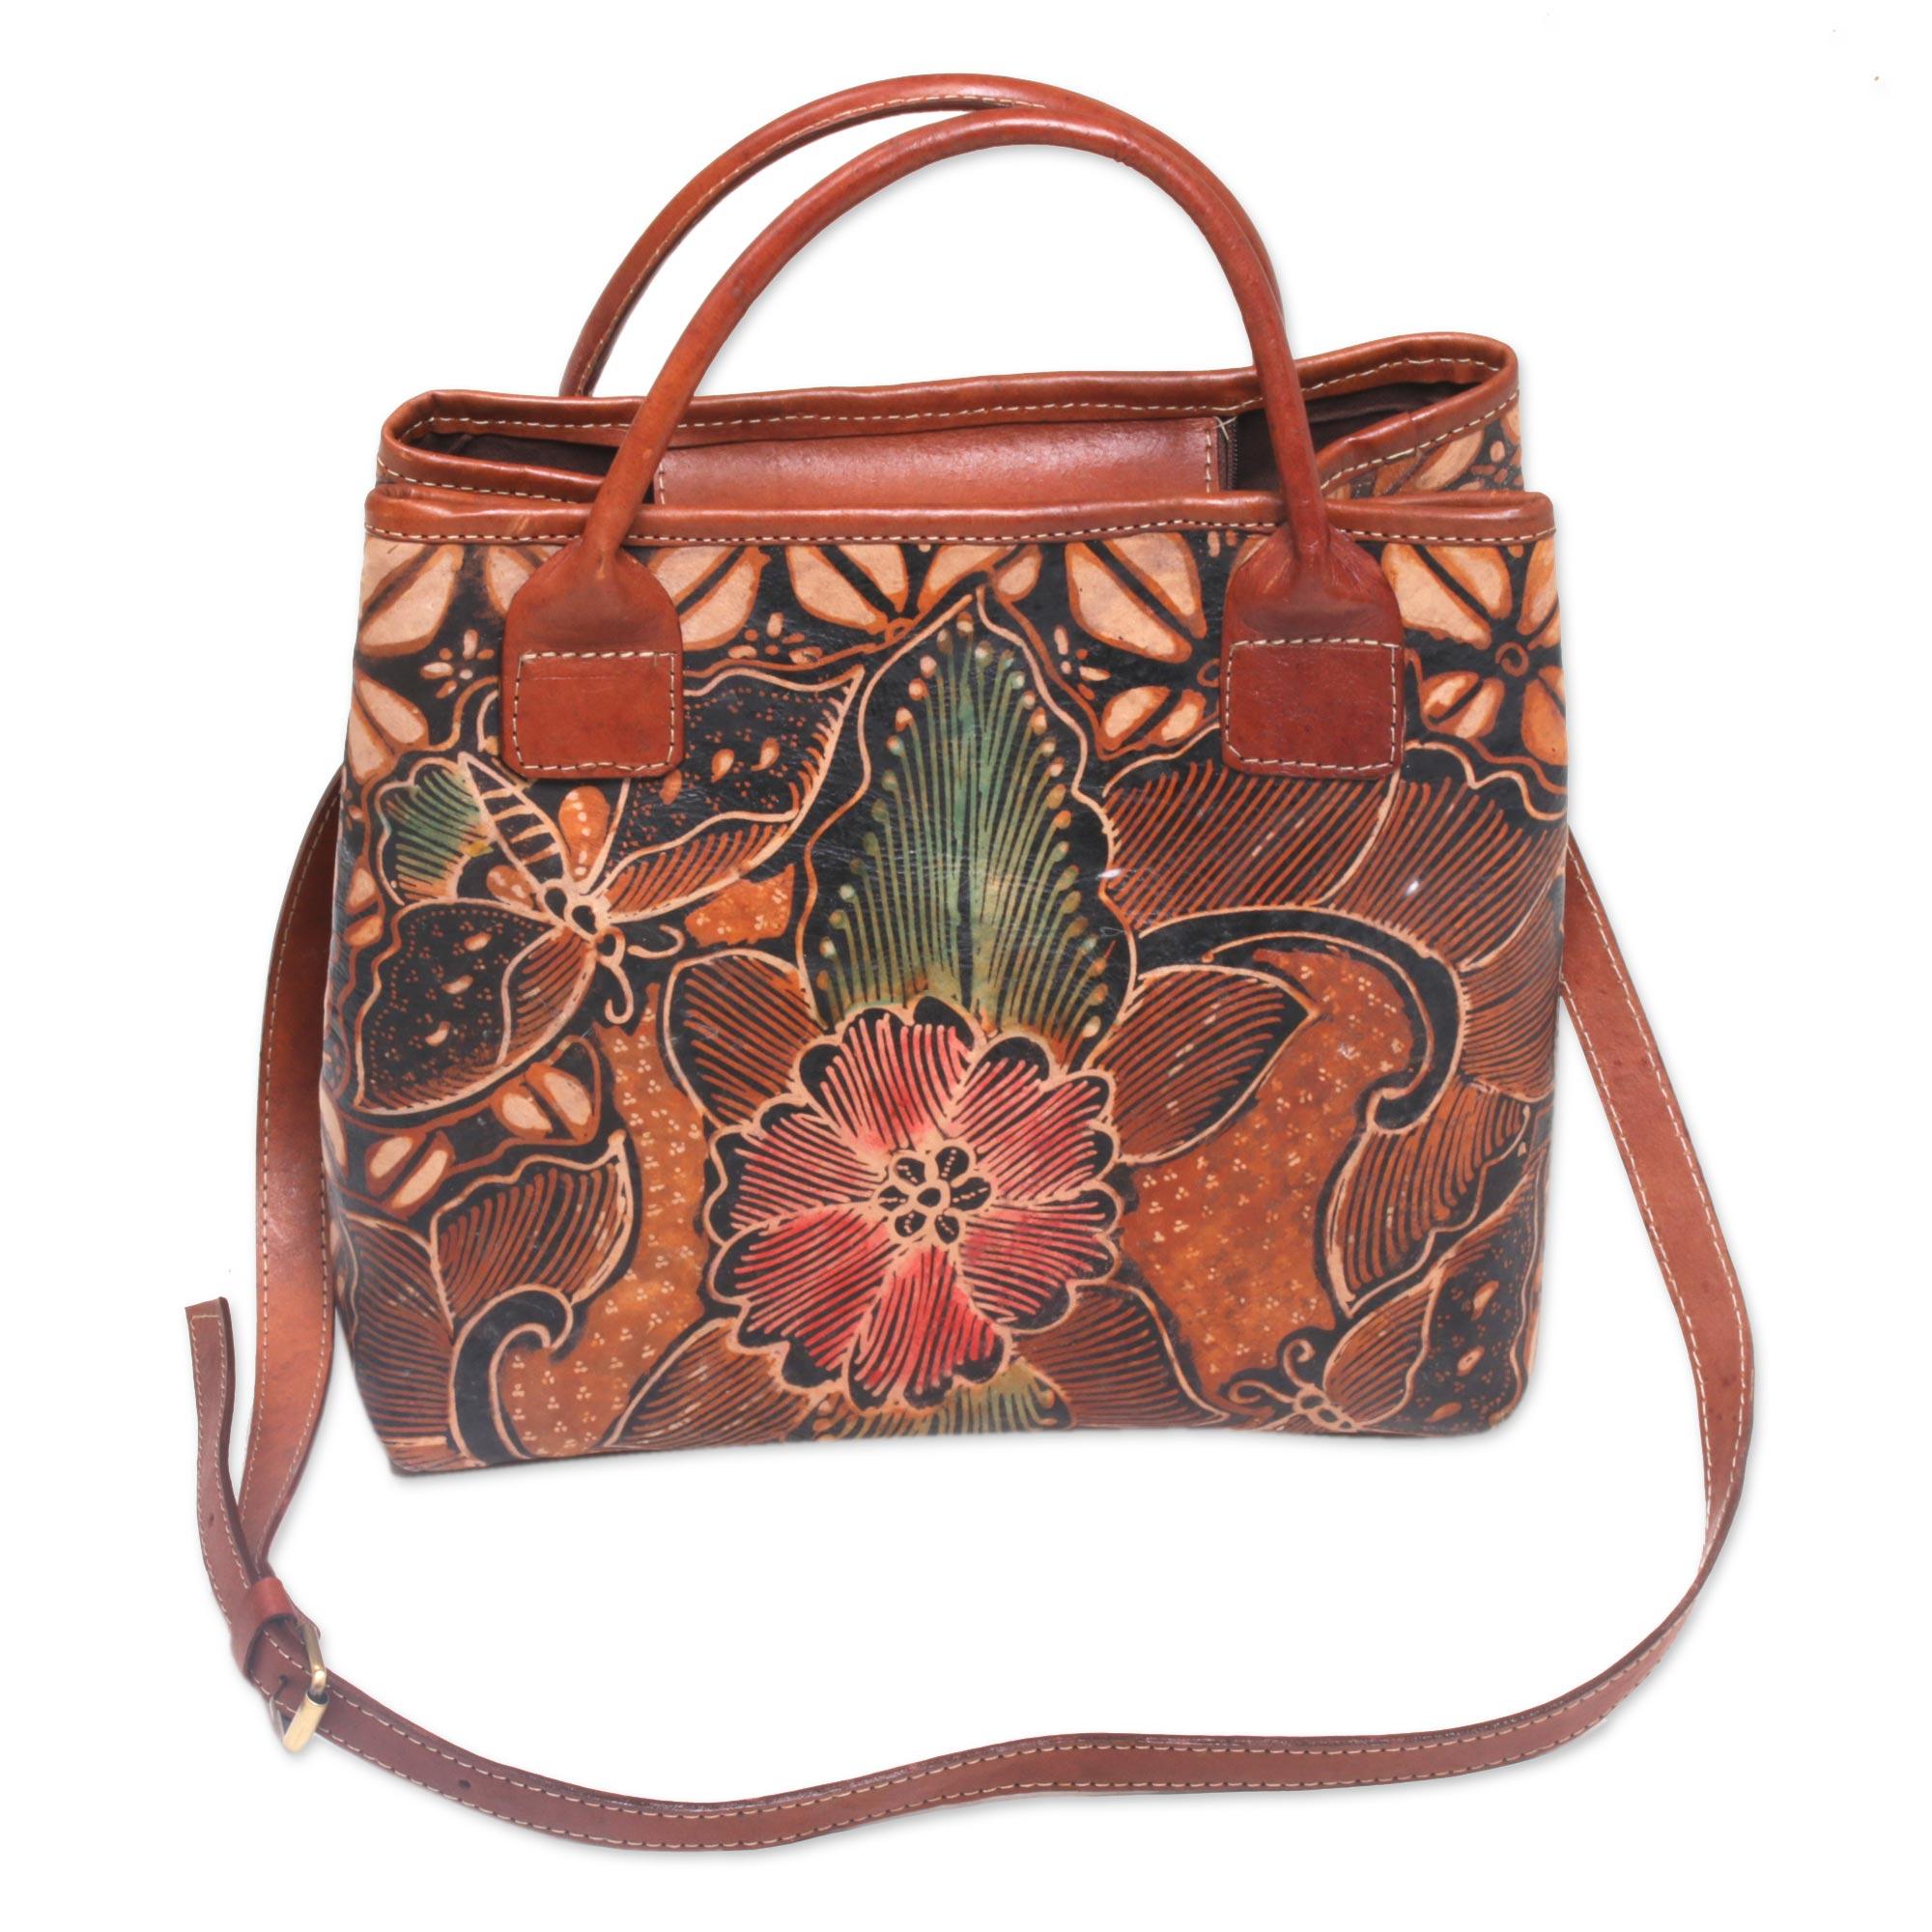 Novica Batik leather handbag, Kembang Kawung